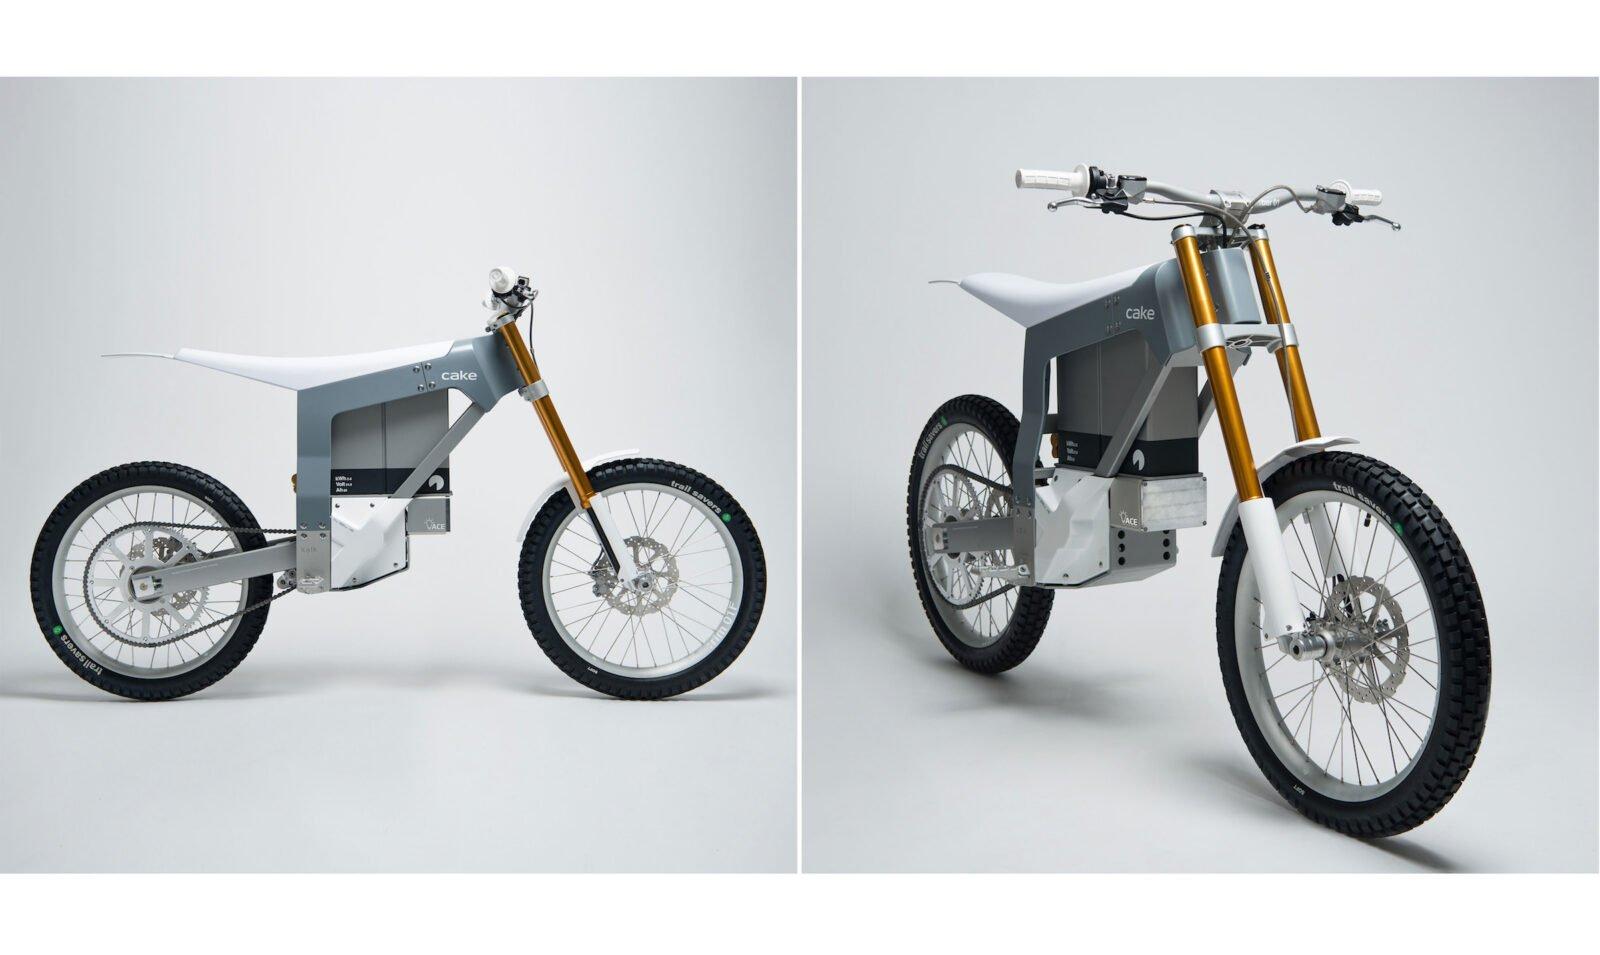 Cake Kalk Dual Sport Electric Bike Main Image 1600x955 - A Two-Wheeled Tesla: The CAKE KALK Dual Sport Electric Bike